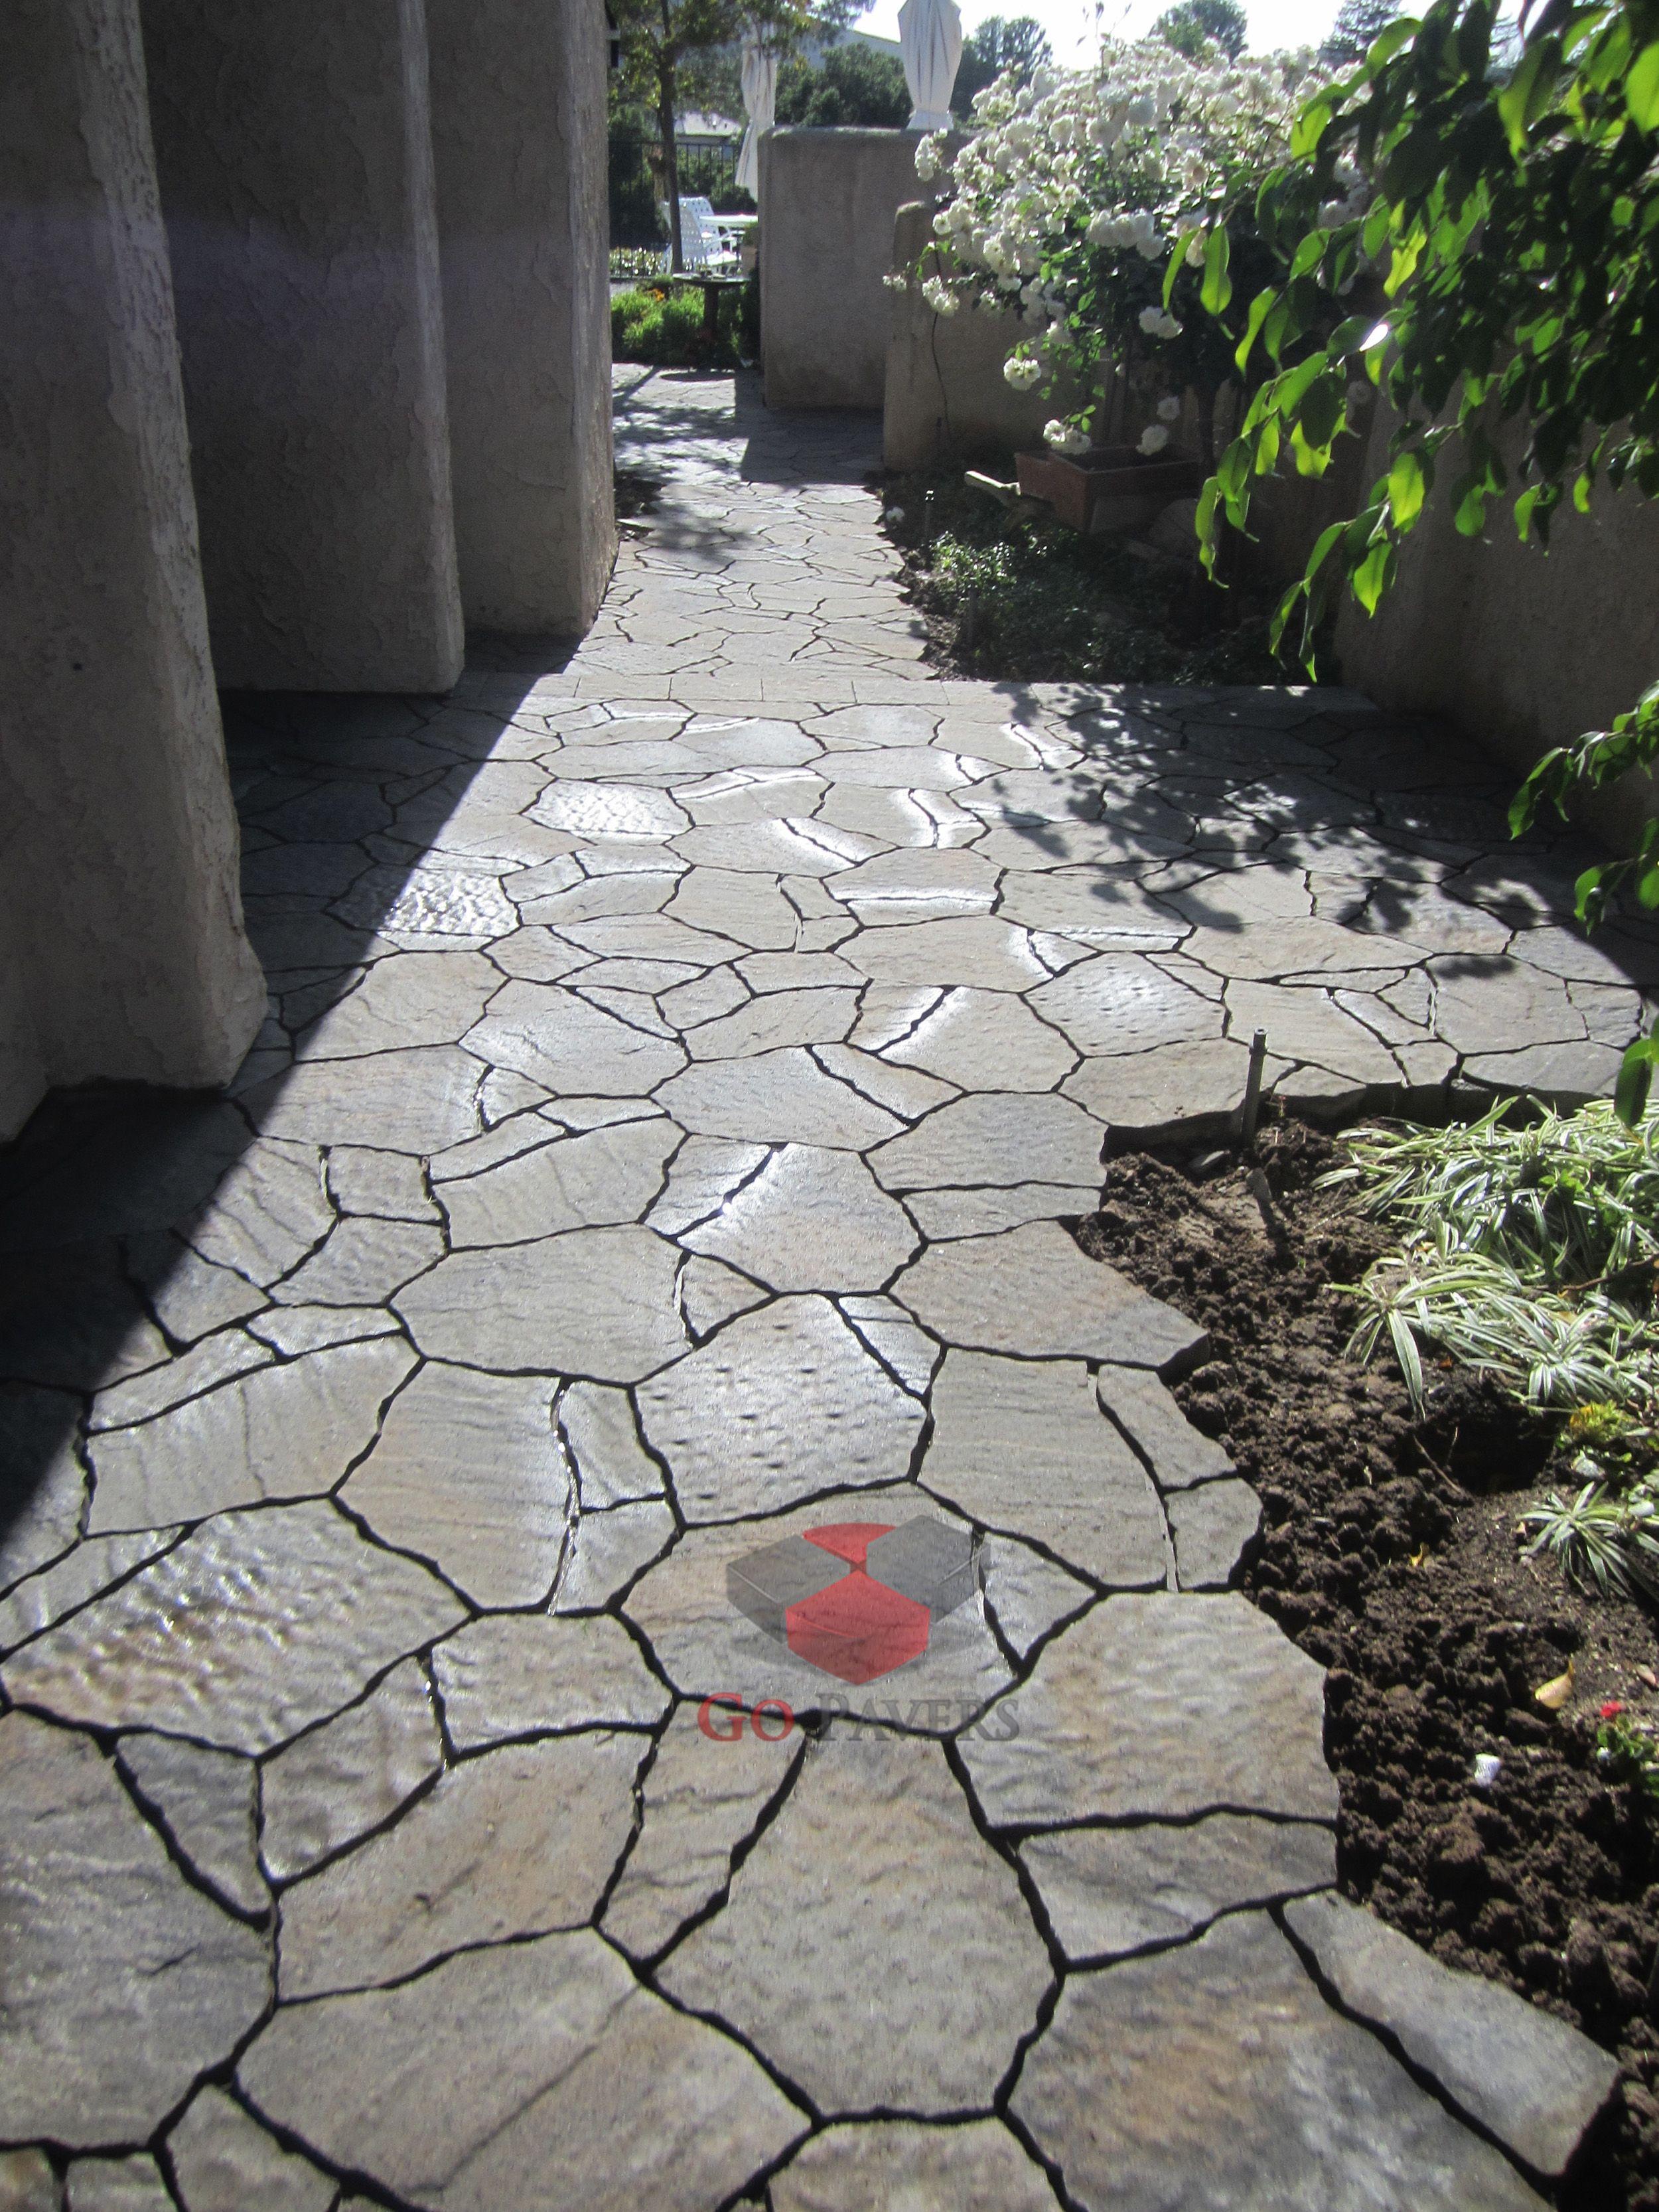 Thousand Oaks Walkway Belgard Mega Arbel Pavers Victorian Color Gopavers